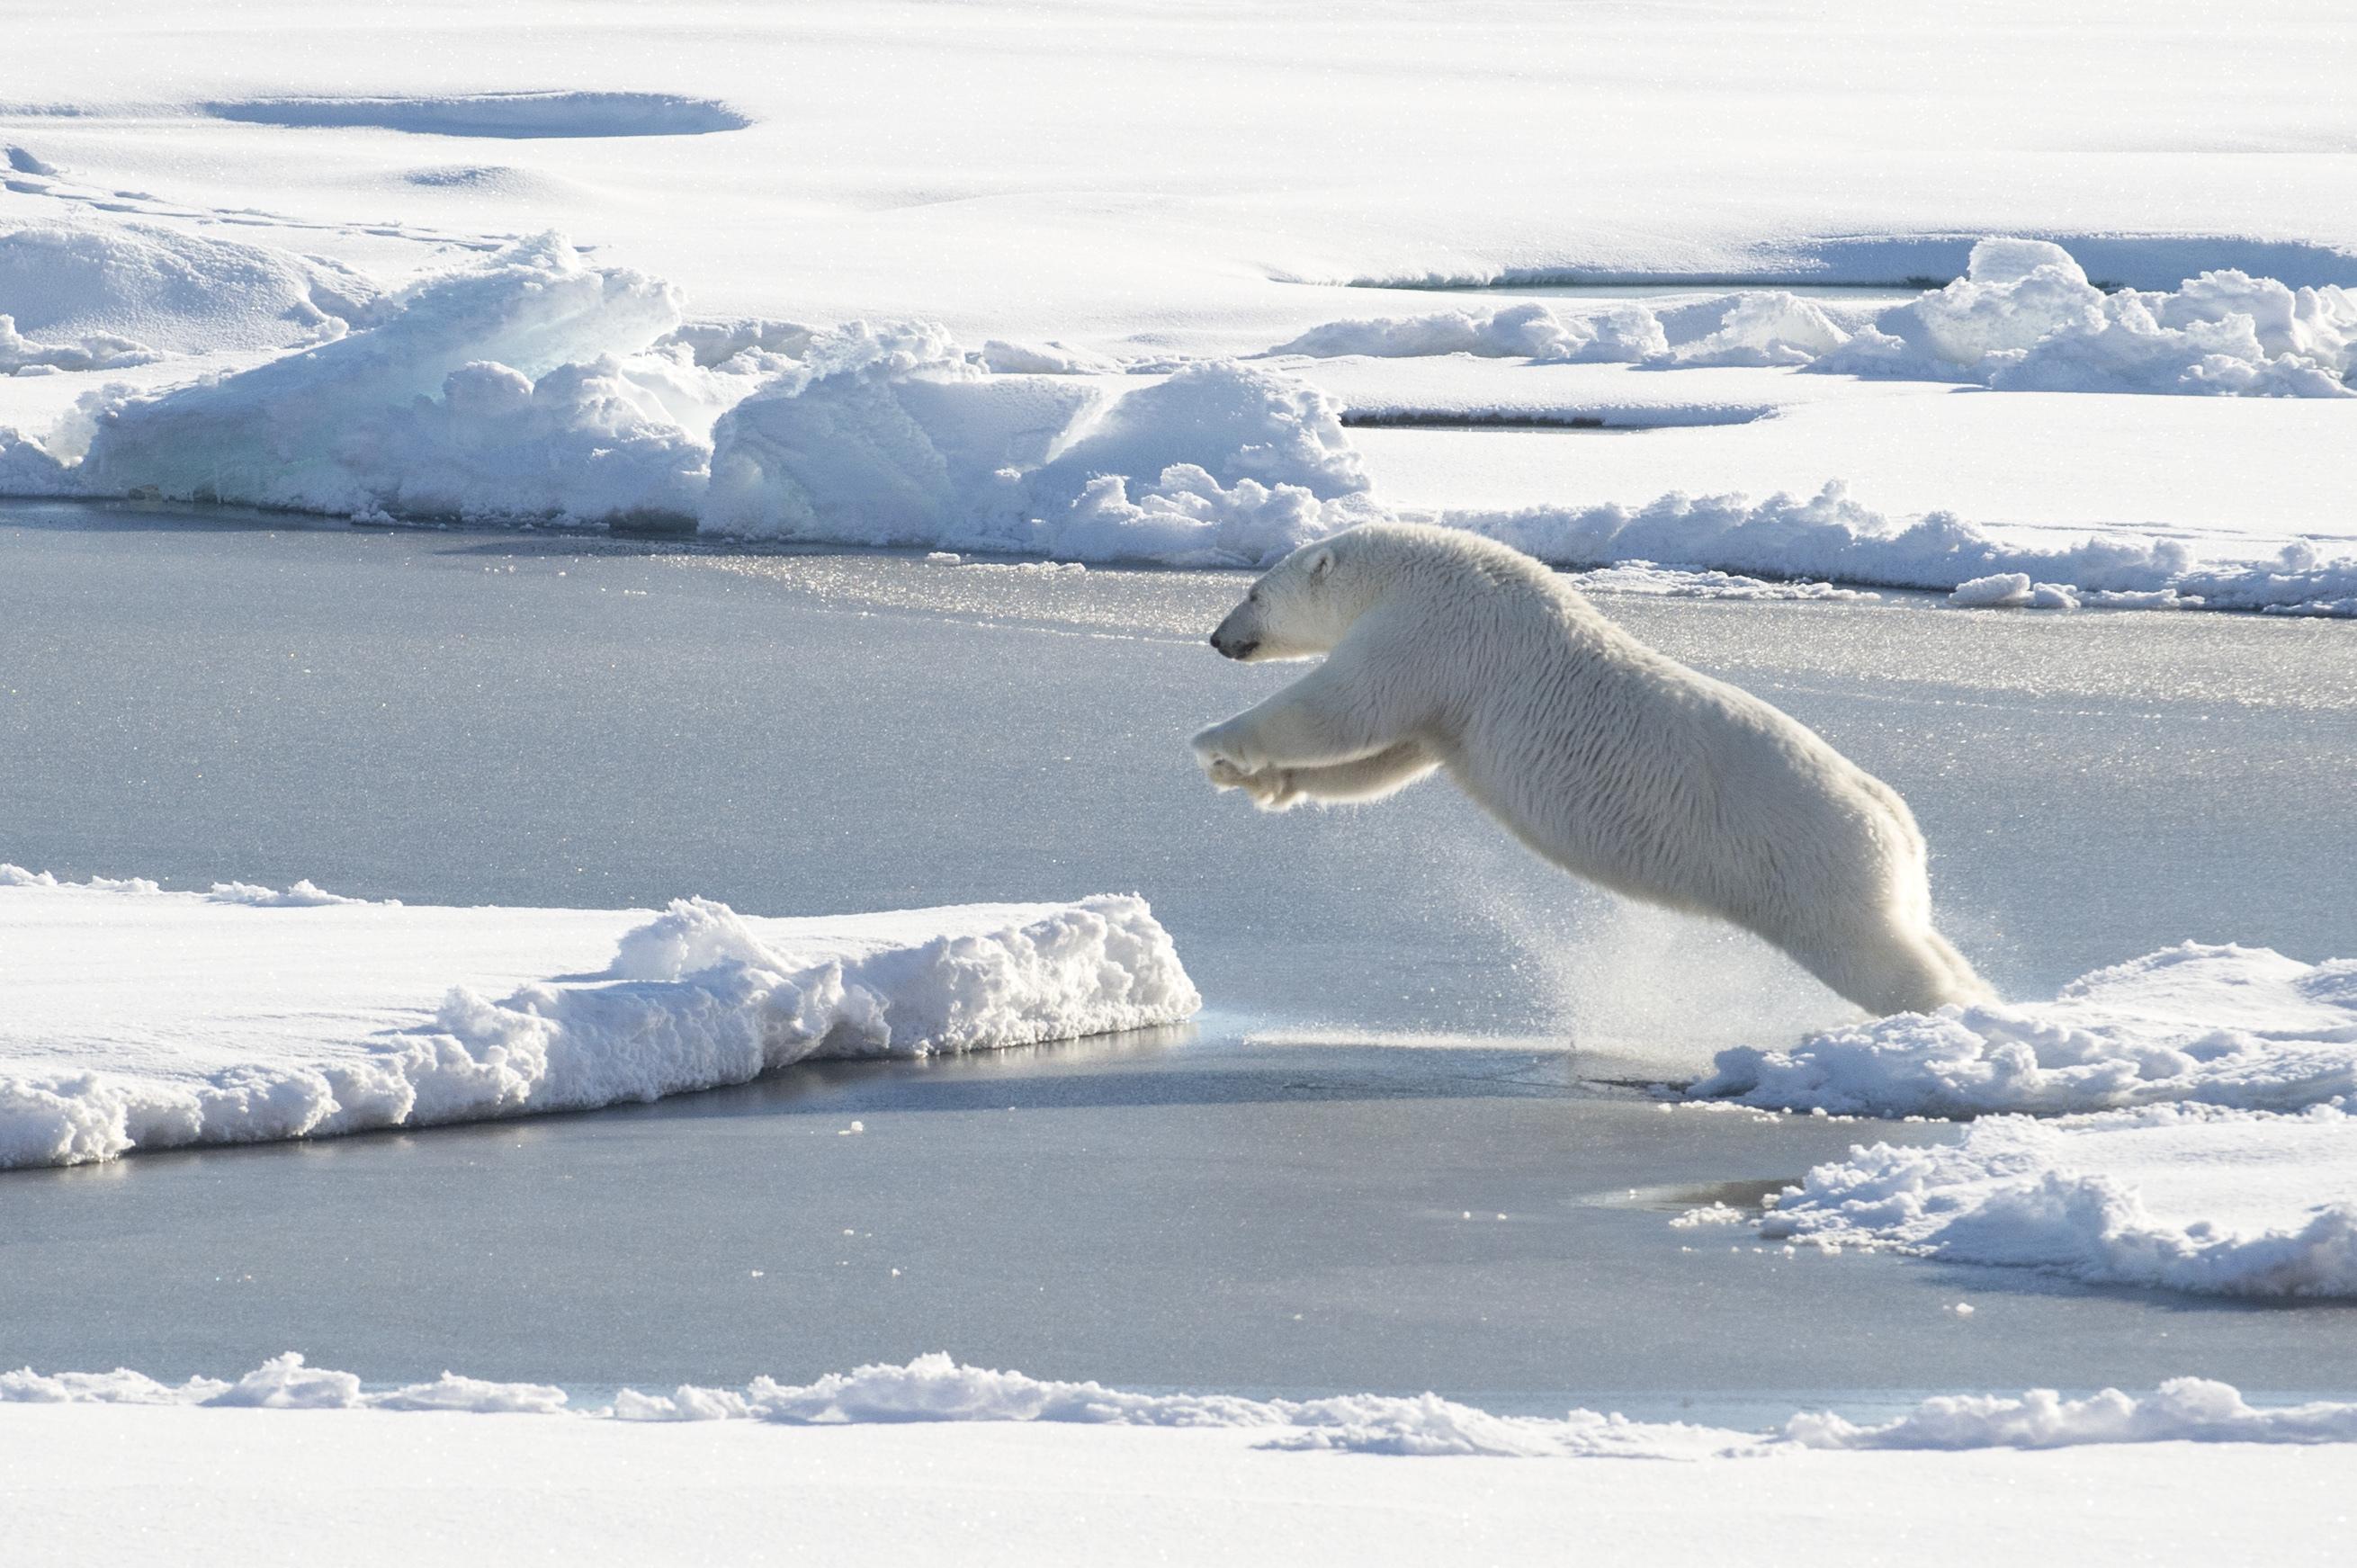 A sarkvidékre mentek filmet forgatni, alig találtak jeget